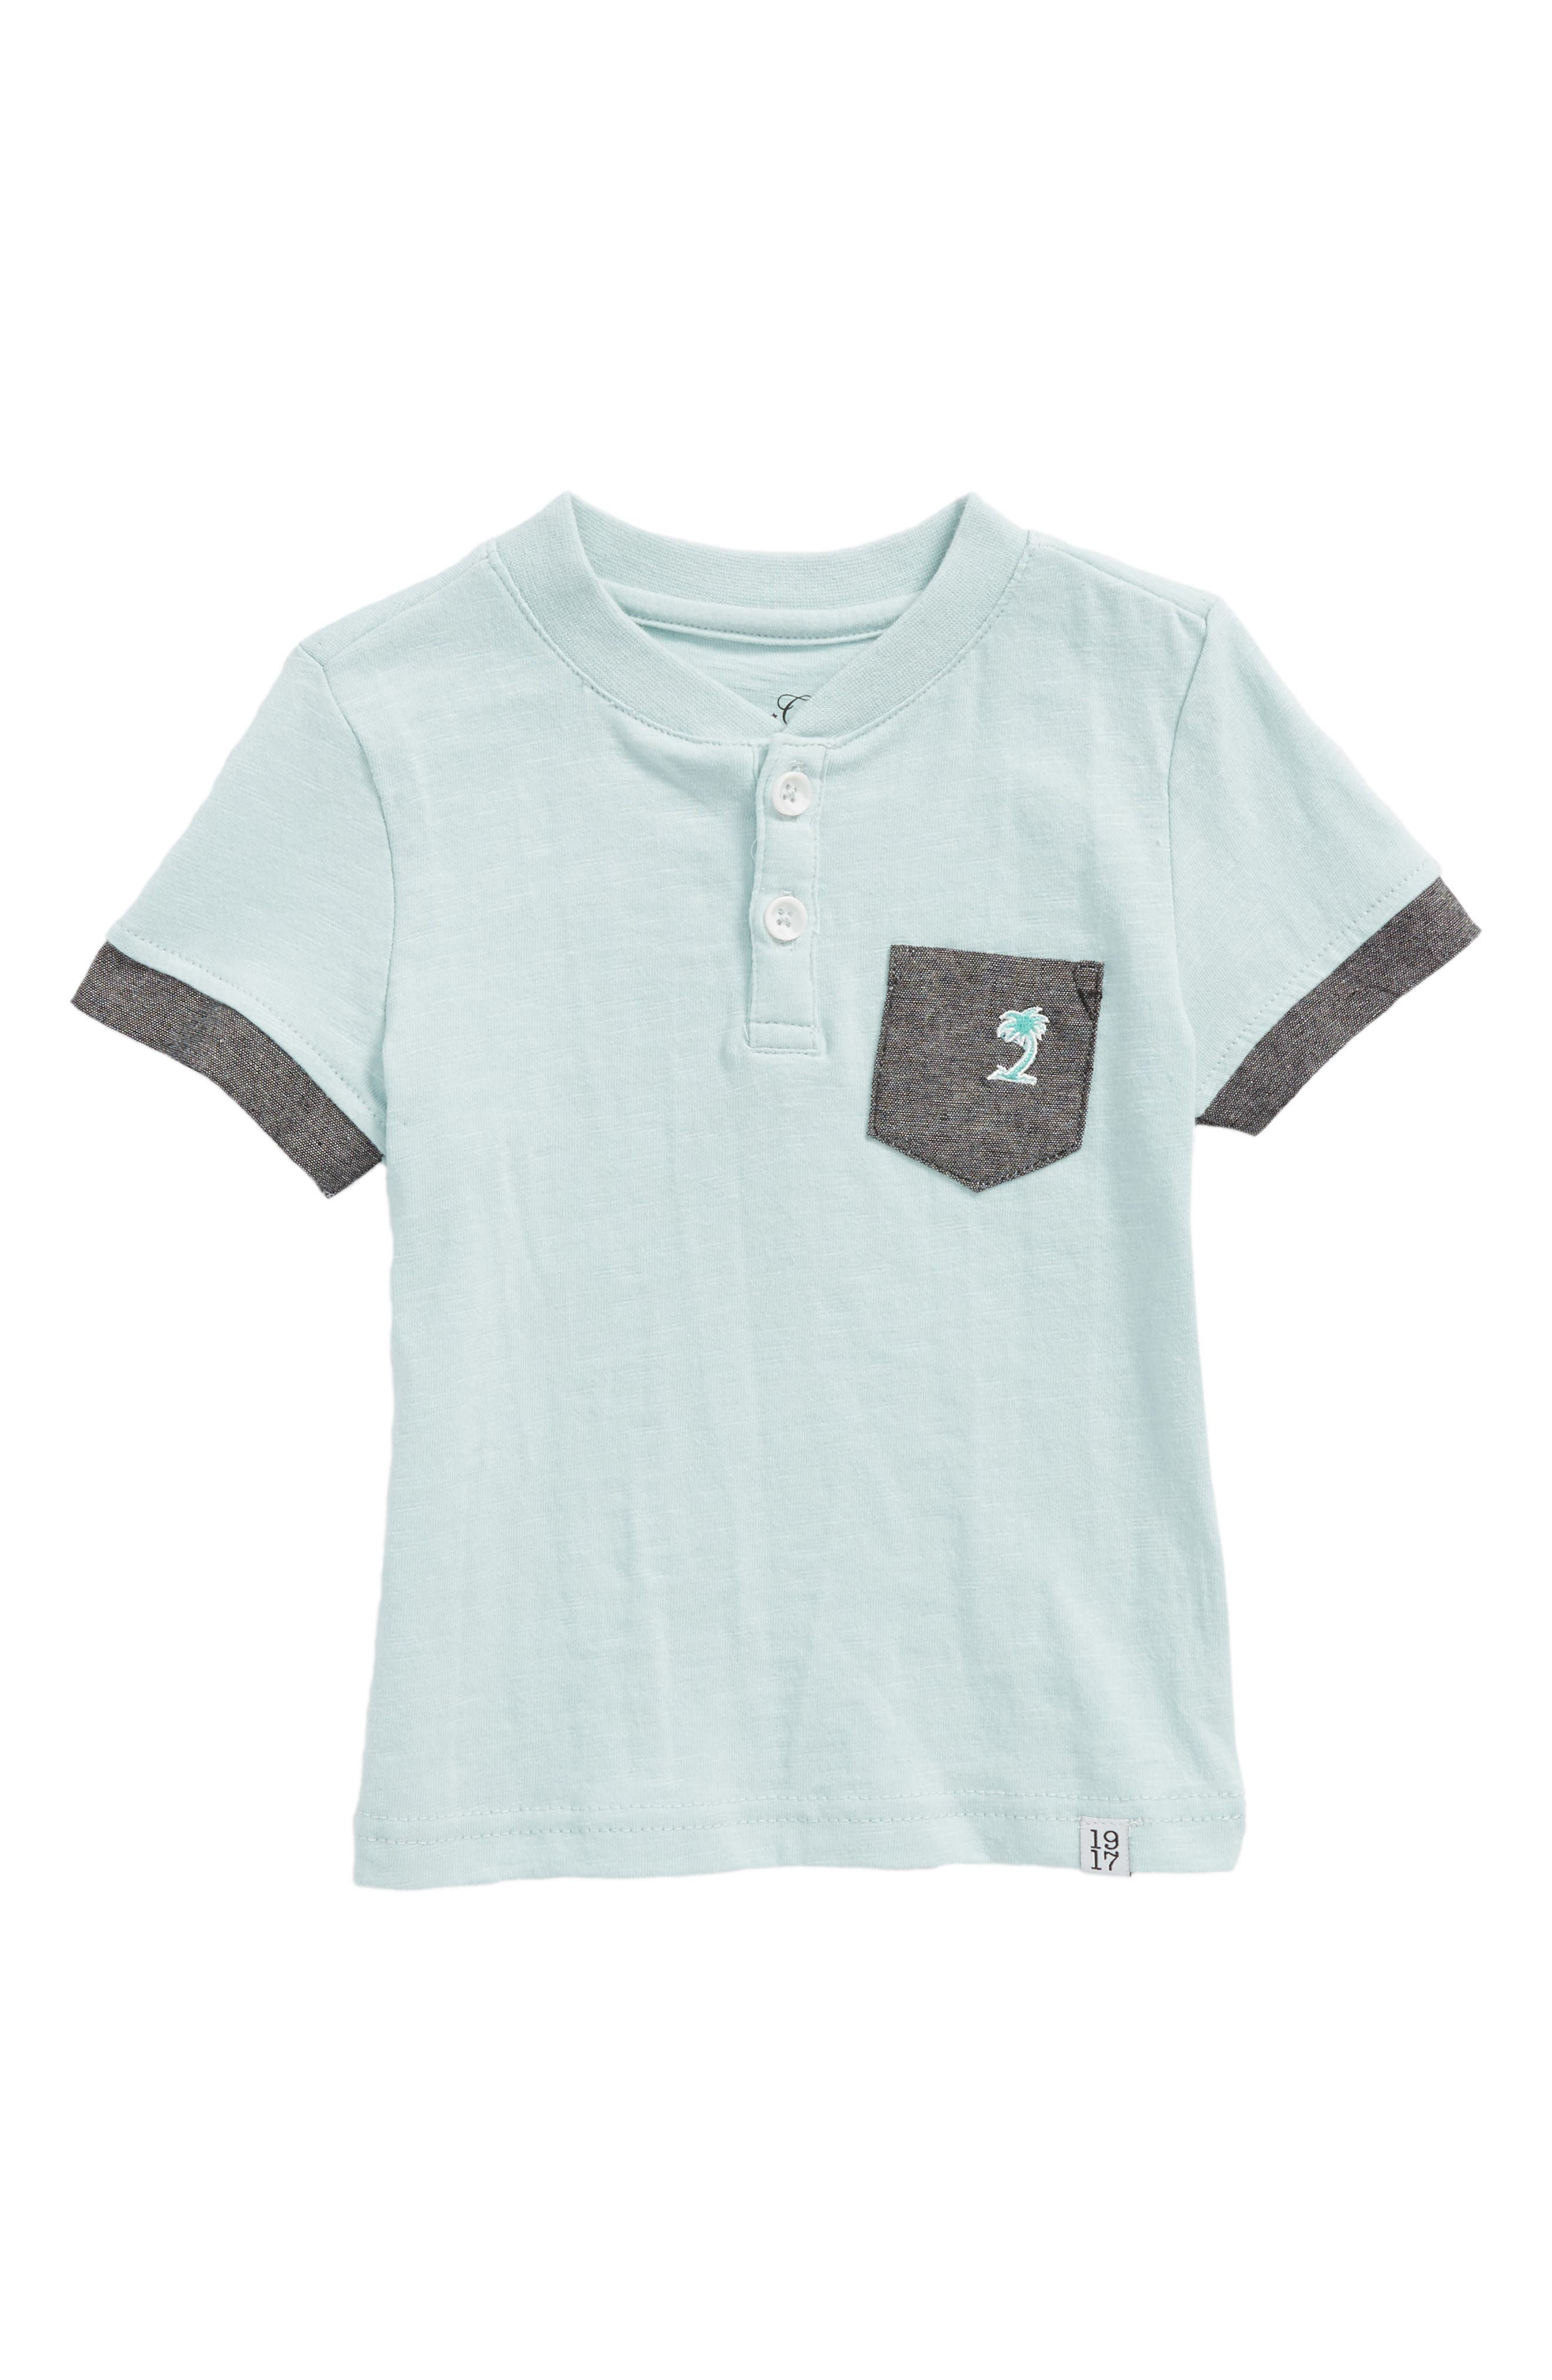 Sovereign Code Goodlife T-Shirt (Baby Boys)